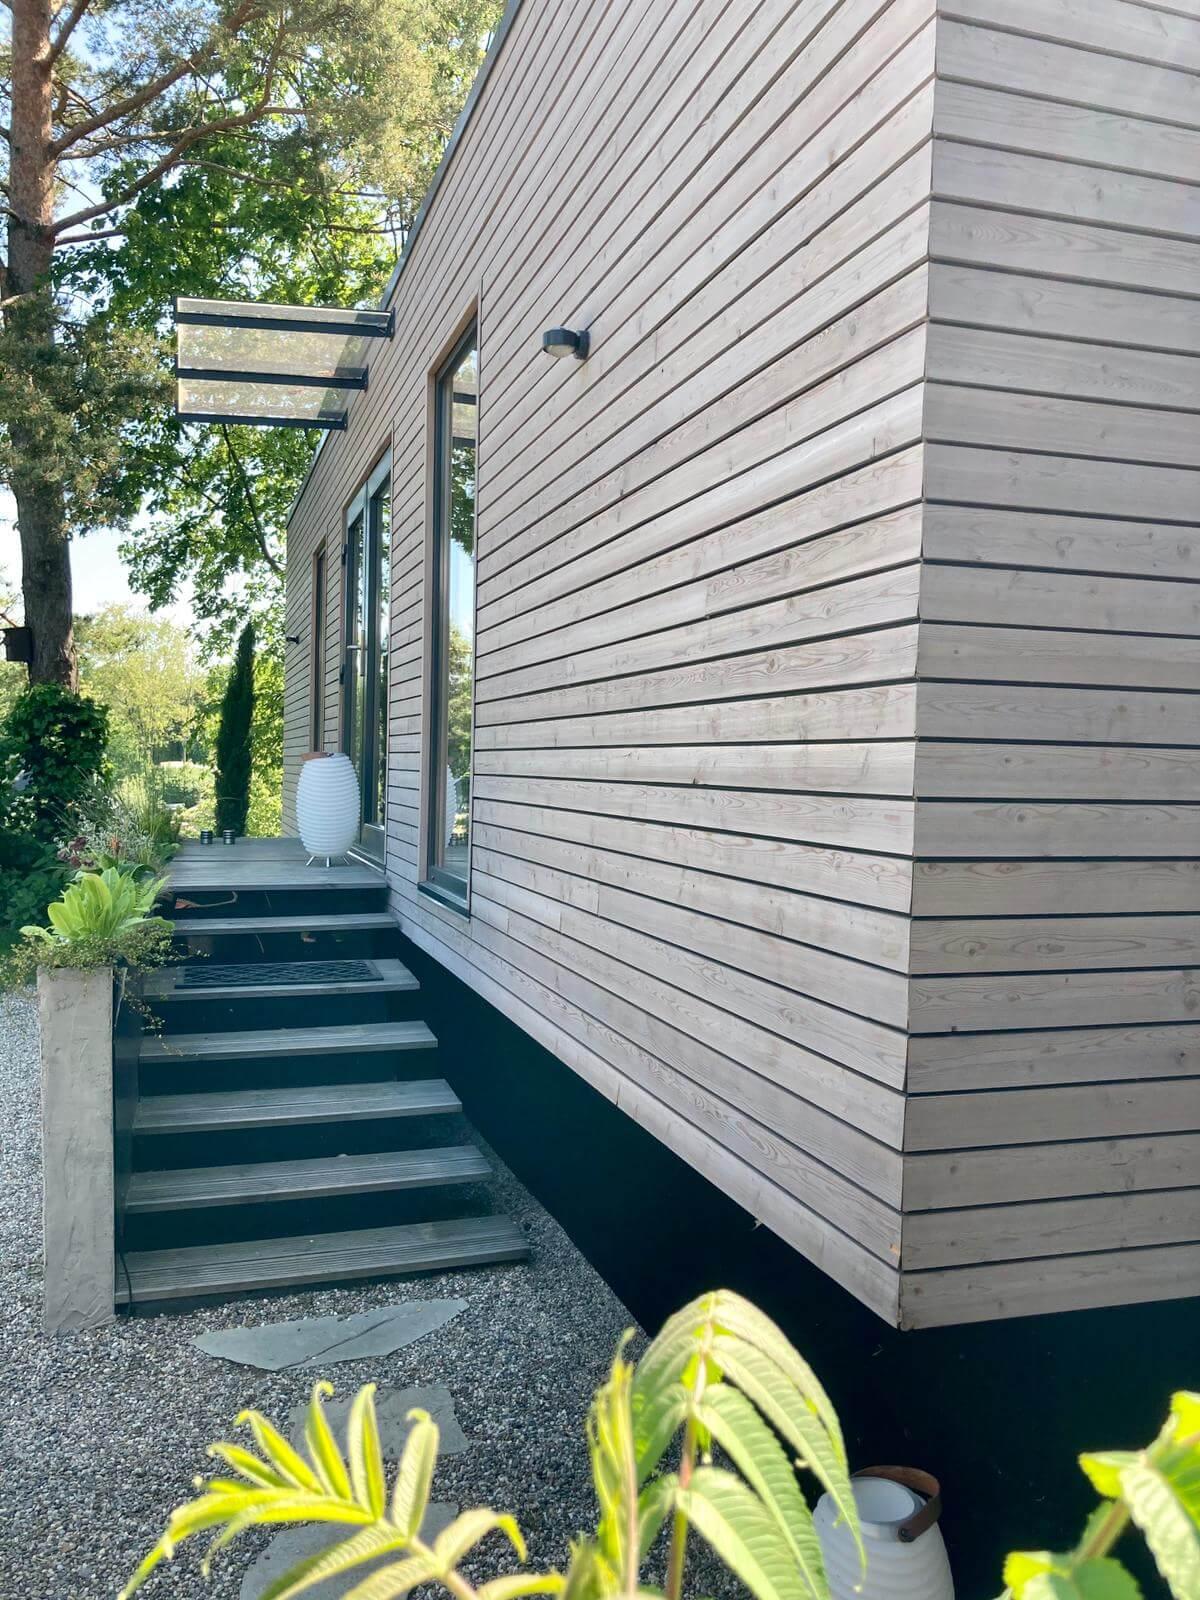 mobiles-chalet-norwegen-mobiles-tiny-house-14